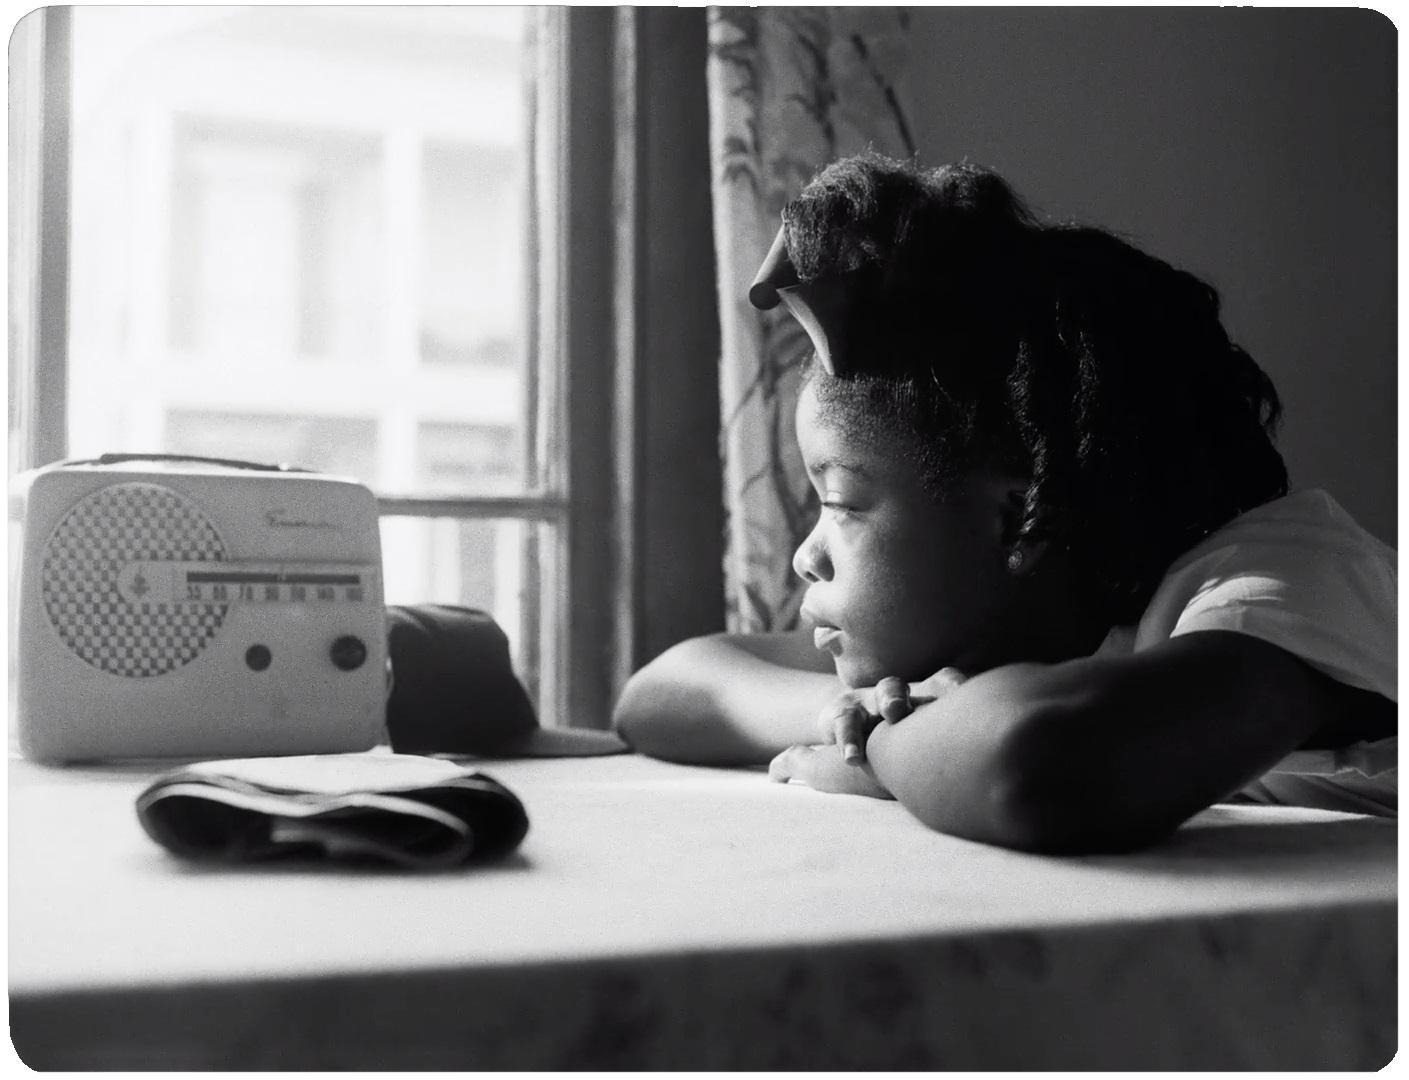 Garrett Bradley's 'America' reframes film history